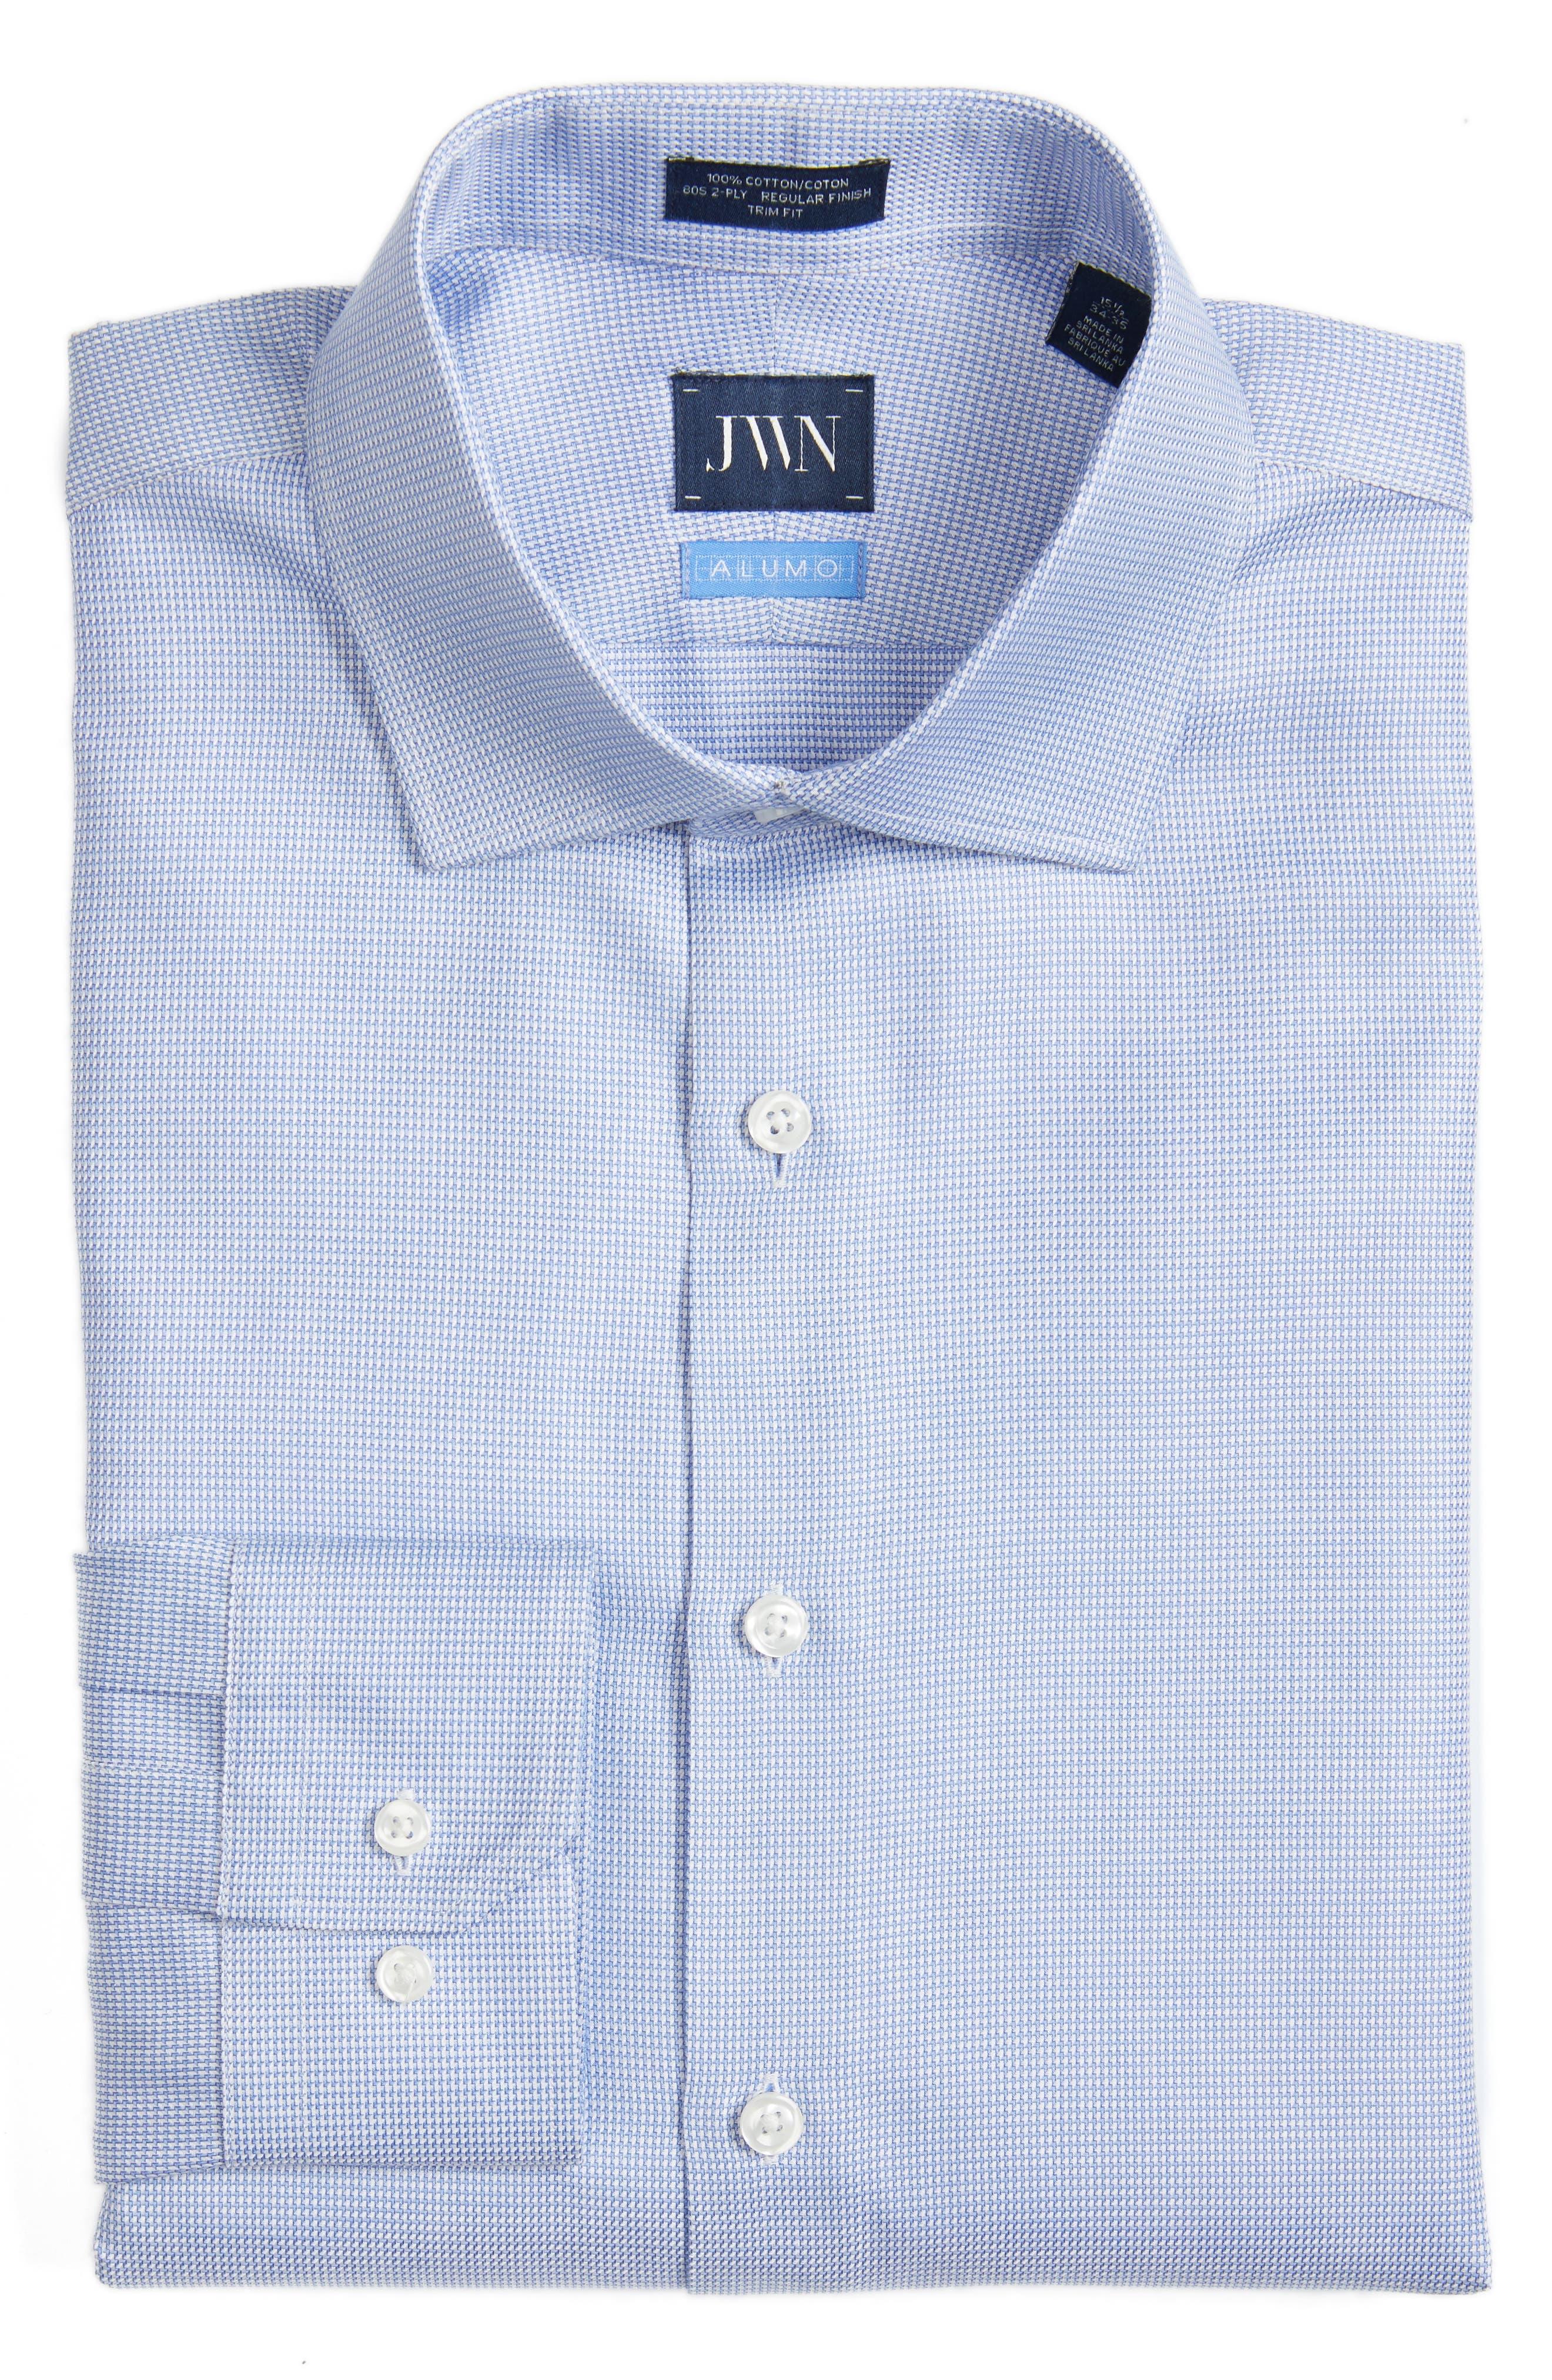 Main Image - John W. Nordstrom® Trim Fit Solid Dress Shirt